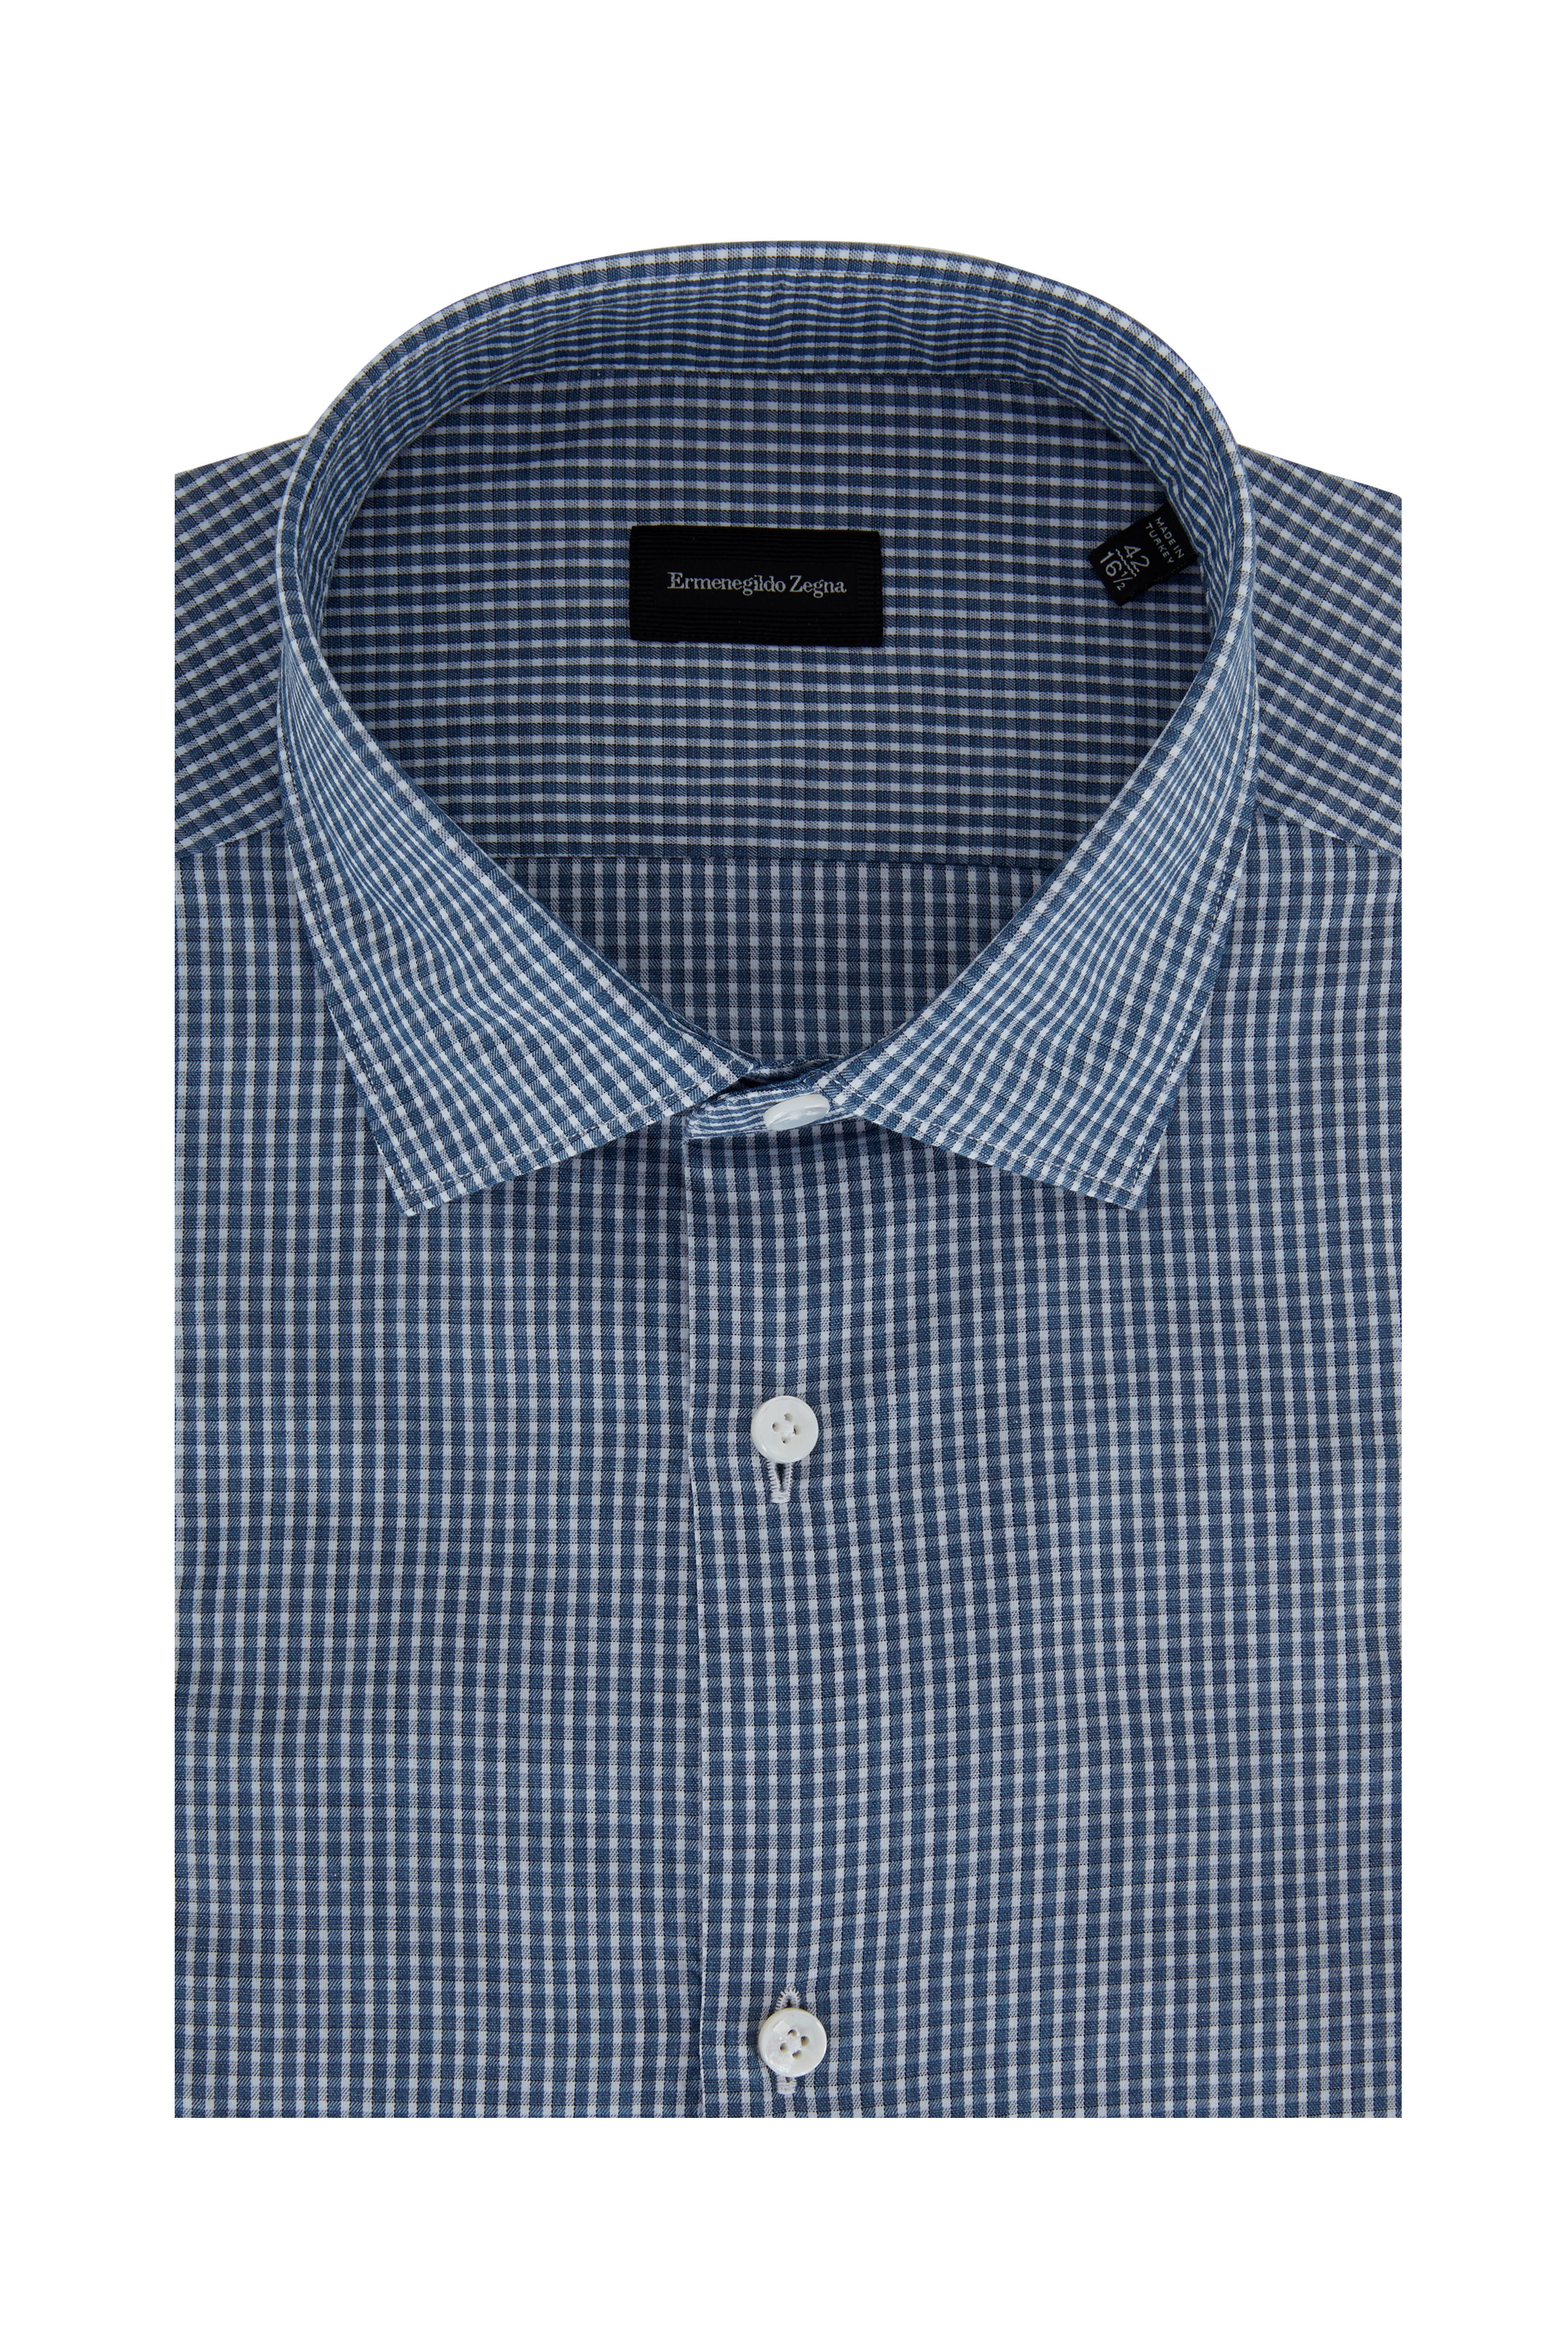 8f1d413a Ermenegildo Zegna - Teal Blue Check Dress Shirt | Mitchell Stores